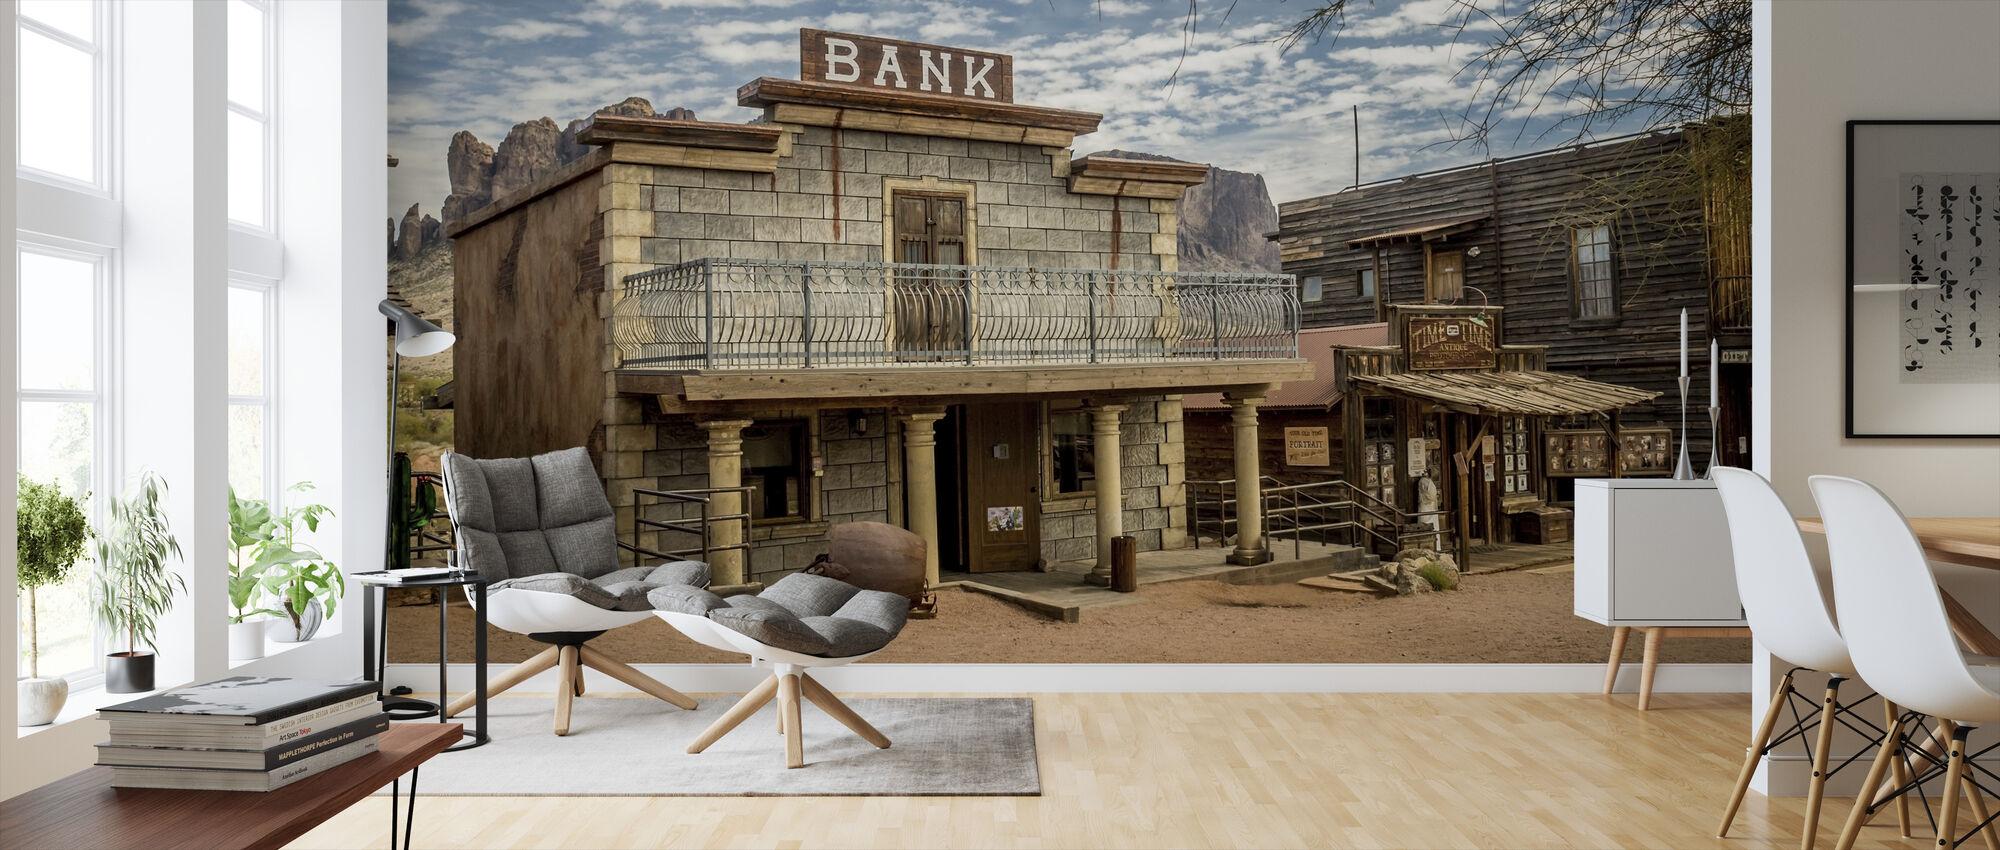 Arizona Vintage Bank - Wallpaper - Living Room